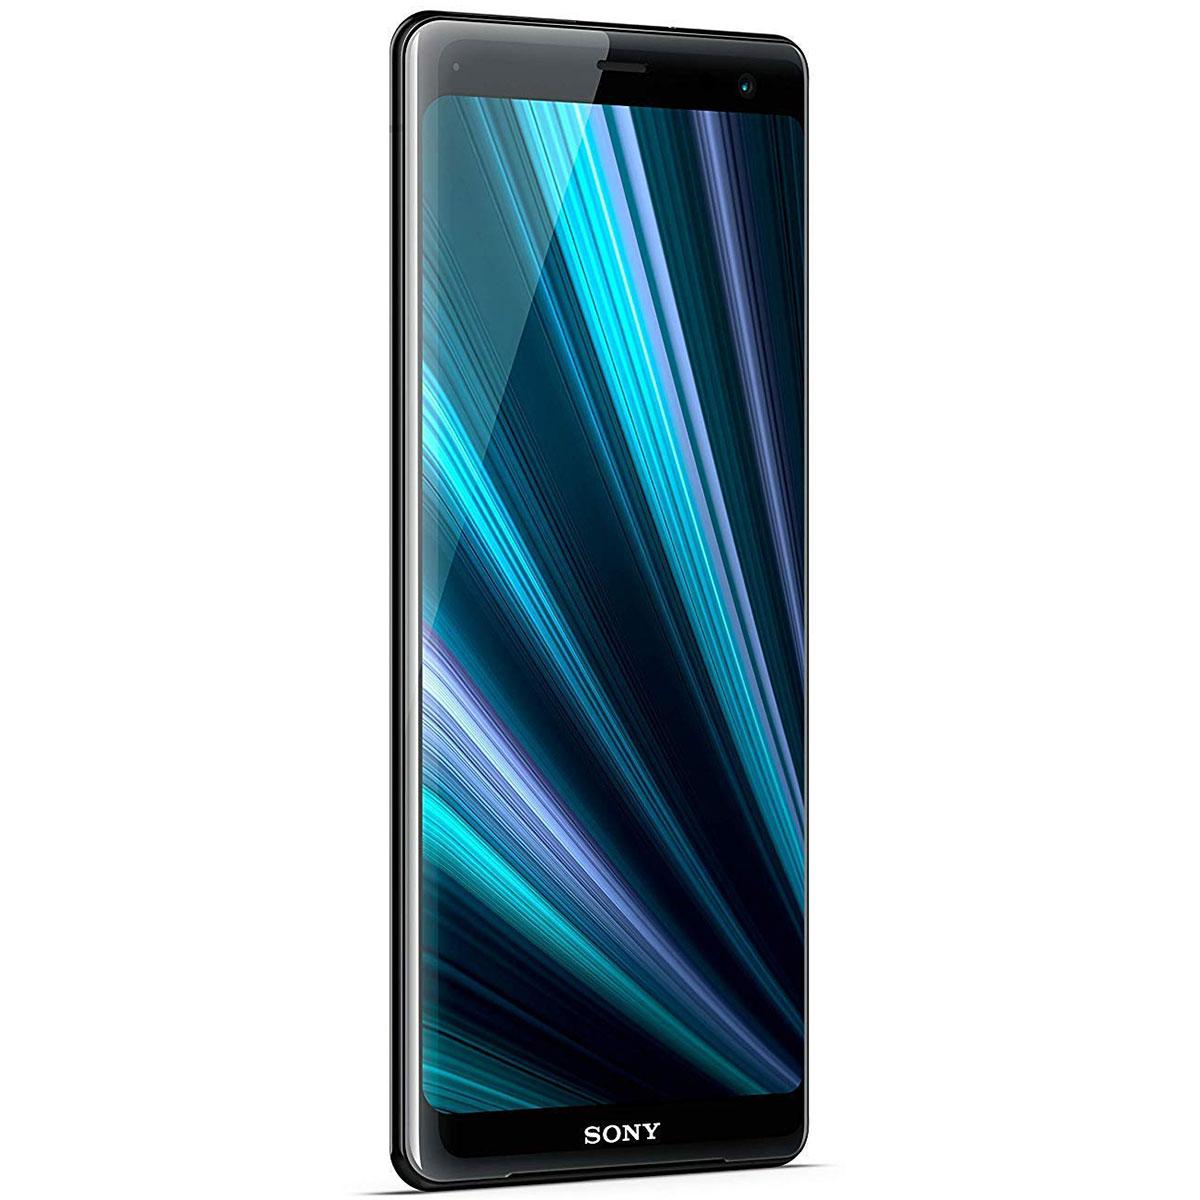 "Mobile & smartphone Sony Xperia XZ3 Dual SIM Noir Smartphone 4G-LTE Advanced IP68 Dual SIM - Snapdragon 845 Octo-Core 2.7 GHz - RAM 4 Go - Ecran tactile 6.0"" 1440 x 2880 - 64 Go - NFC/Bluetooth 5.0 - 3330 mAh - Android 9.0"